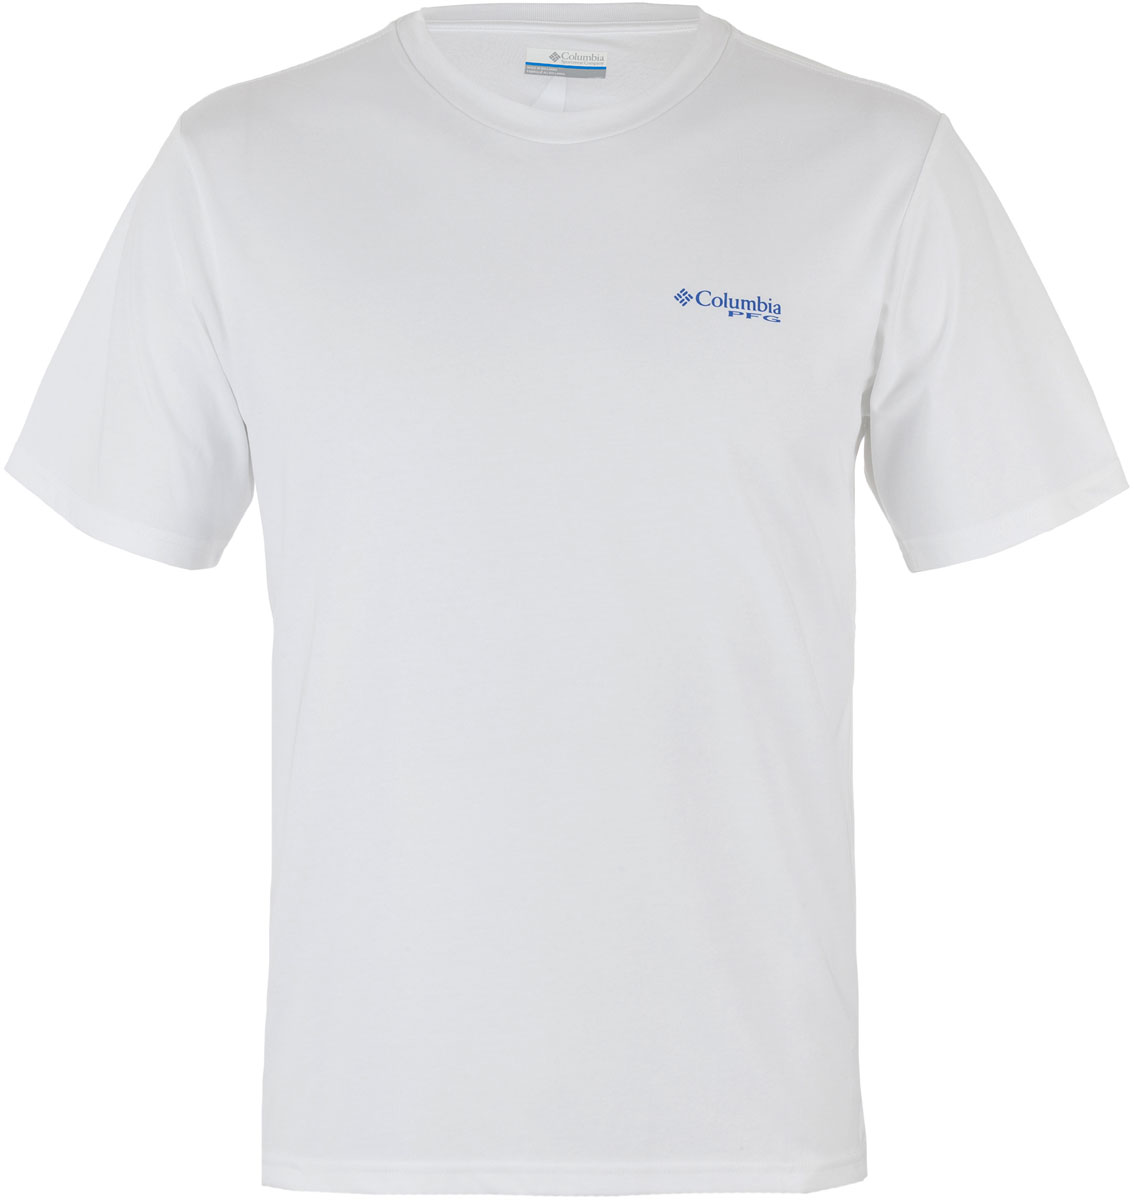 Футболка мужская Columbia PFG Shoreline Slam II SS T-shirt, цвет: белый. 1717161-100. Размер XL (52/54)